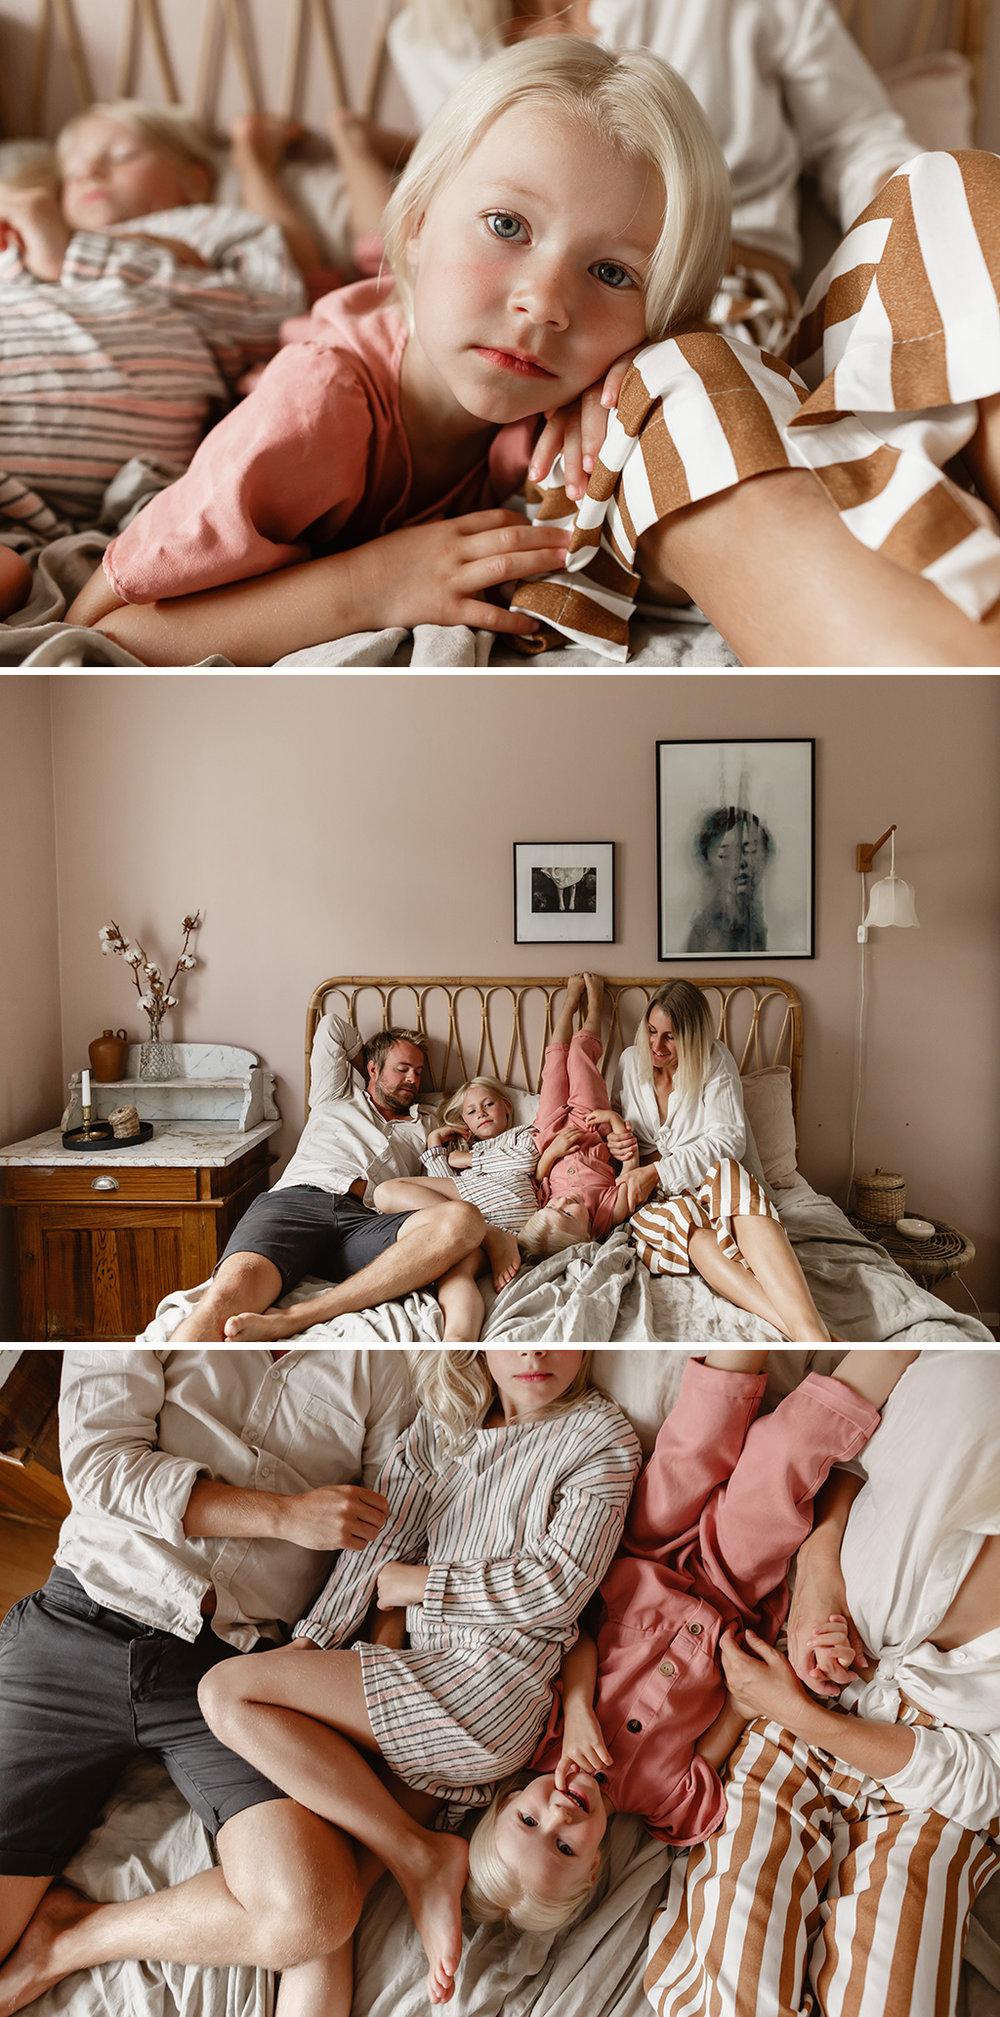 Lifestyle_familjefotografering_Stockholm_hemma-hos-fotografering_lifestyle-inhome-session_4.jpg